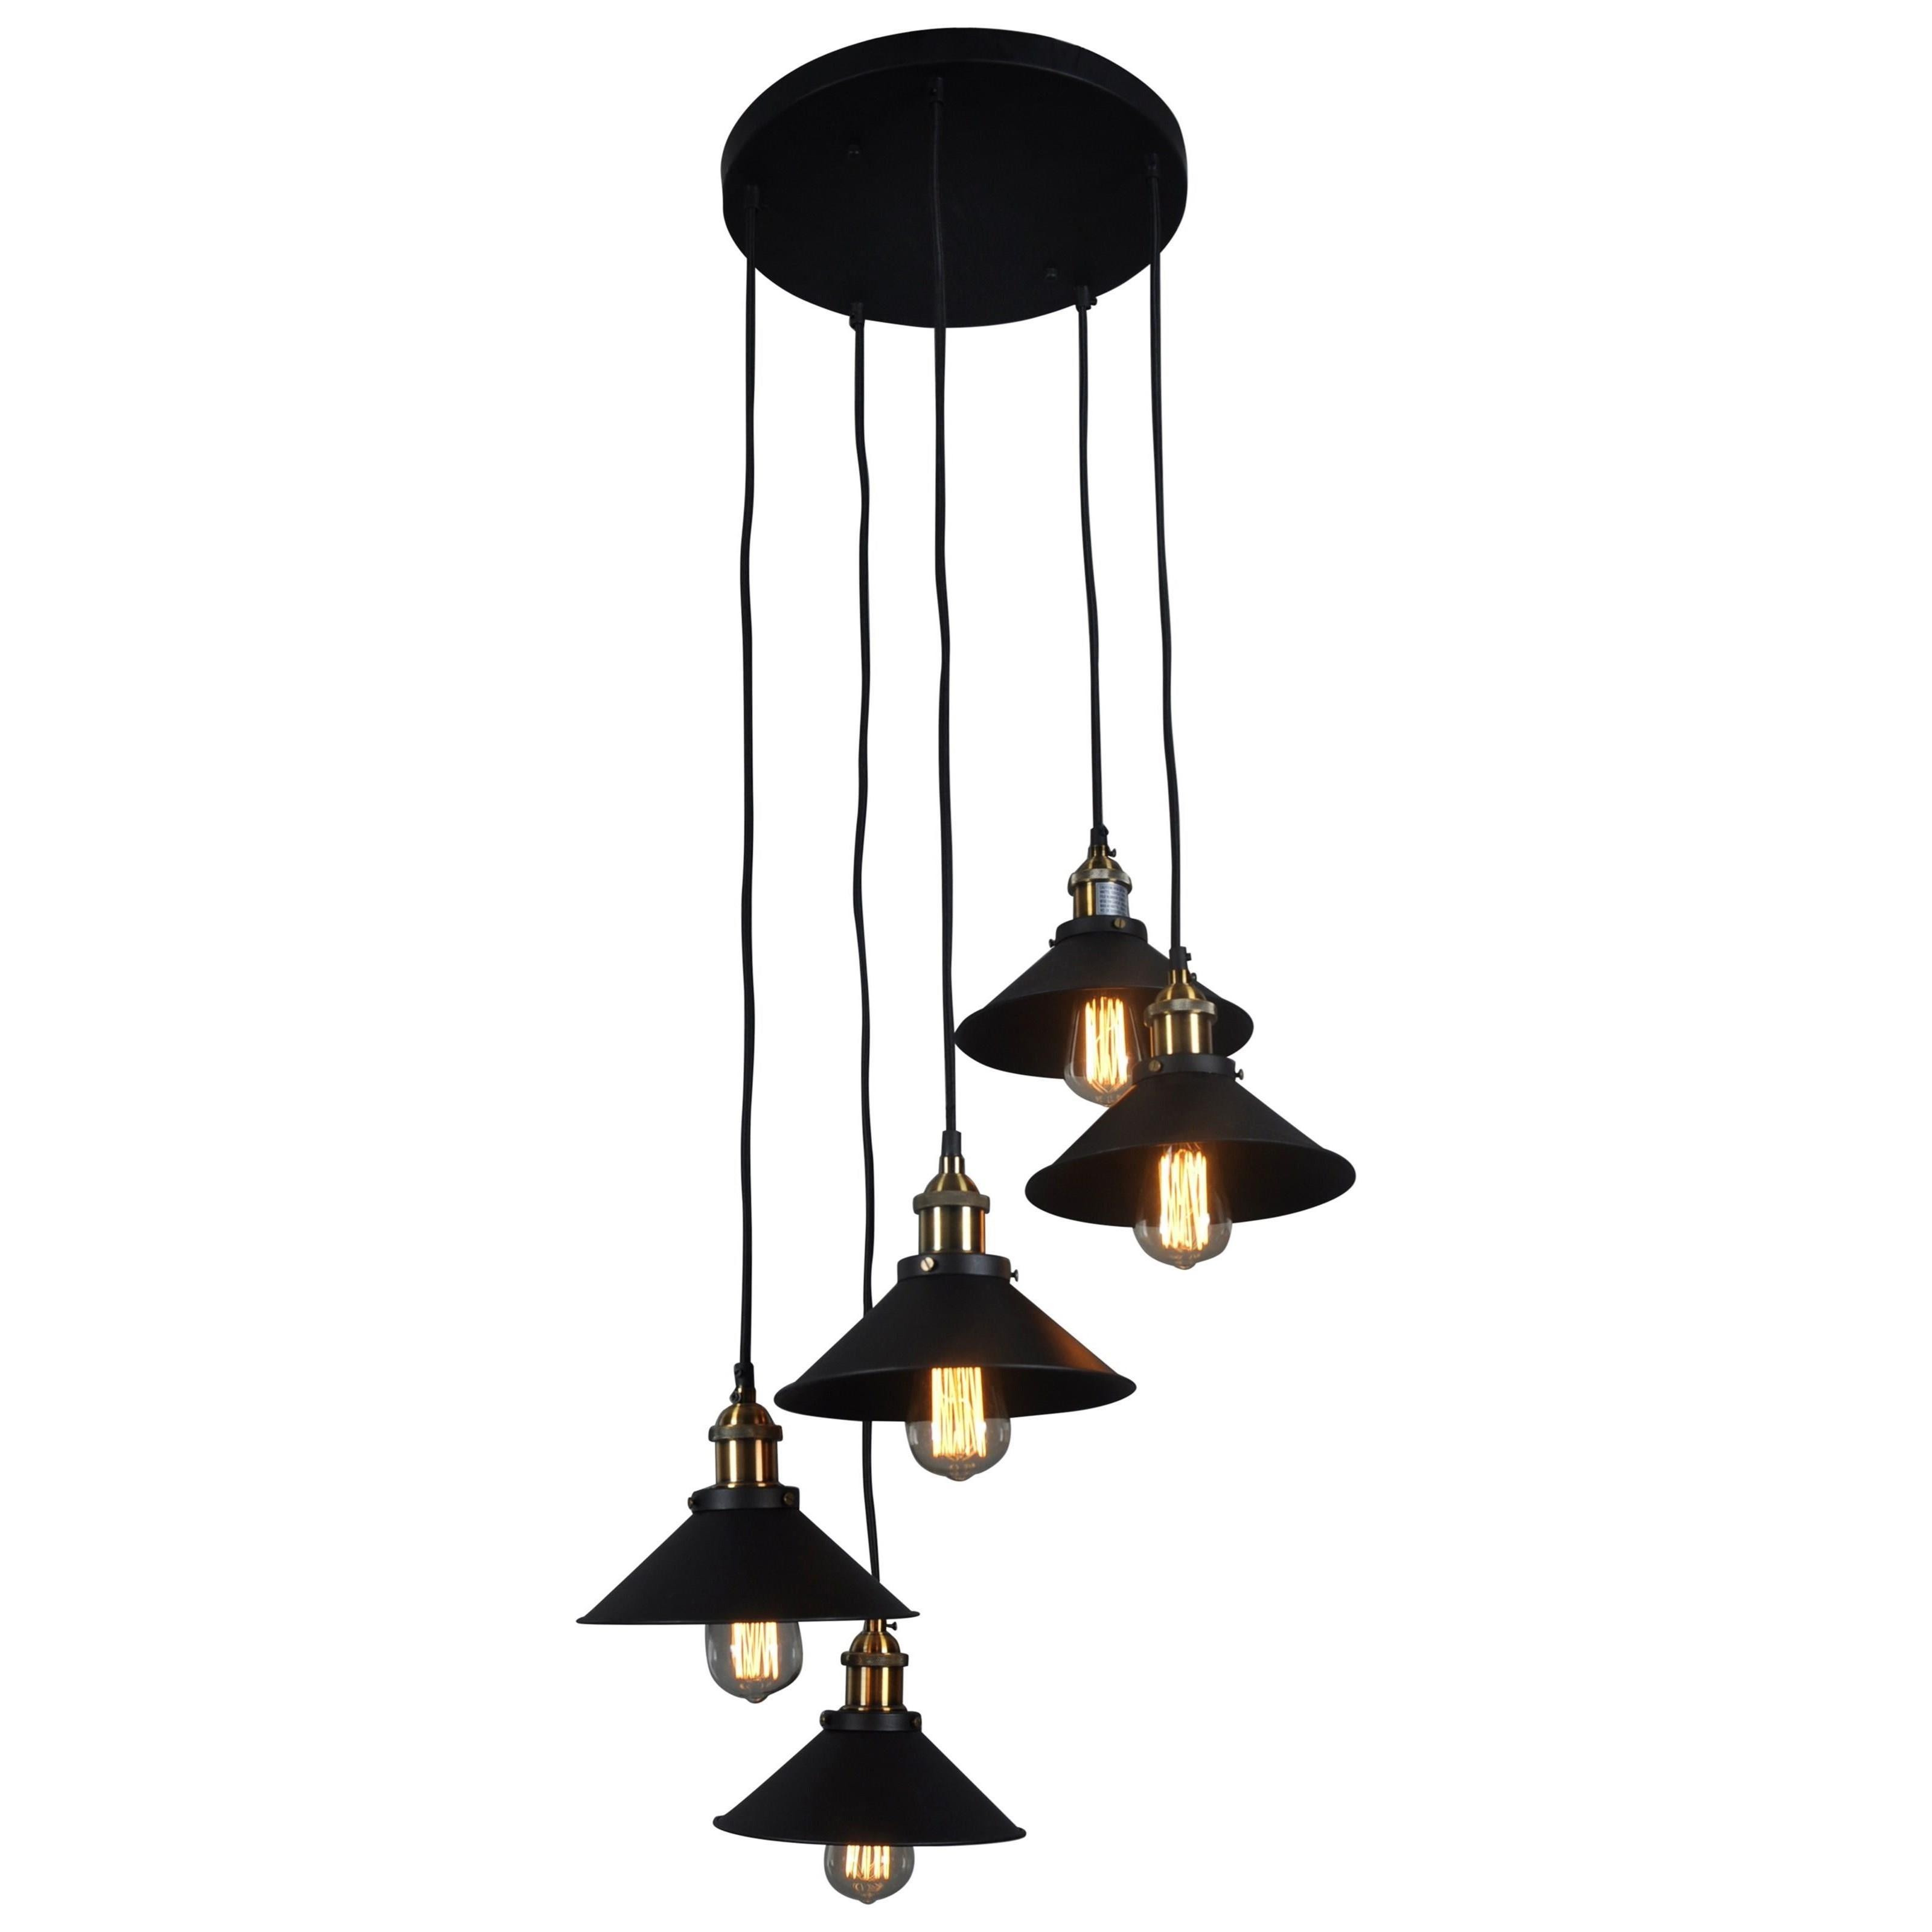 Lighting Renata Circular 5 Light Pendant Lamp Black by Moe's Home Collection at Stoney Creek Furniture